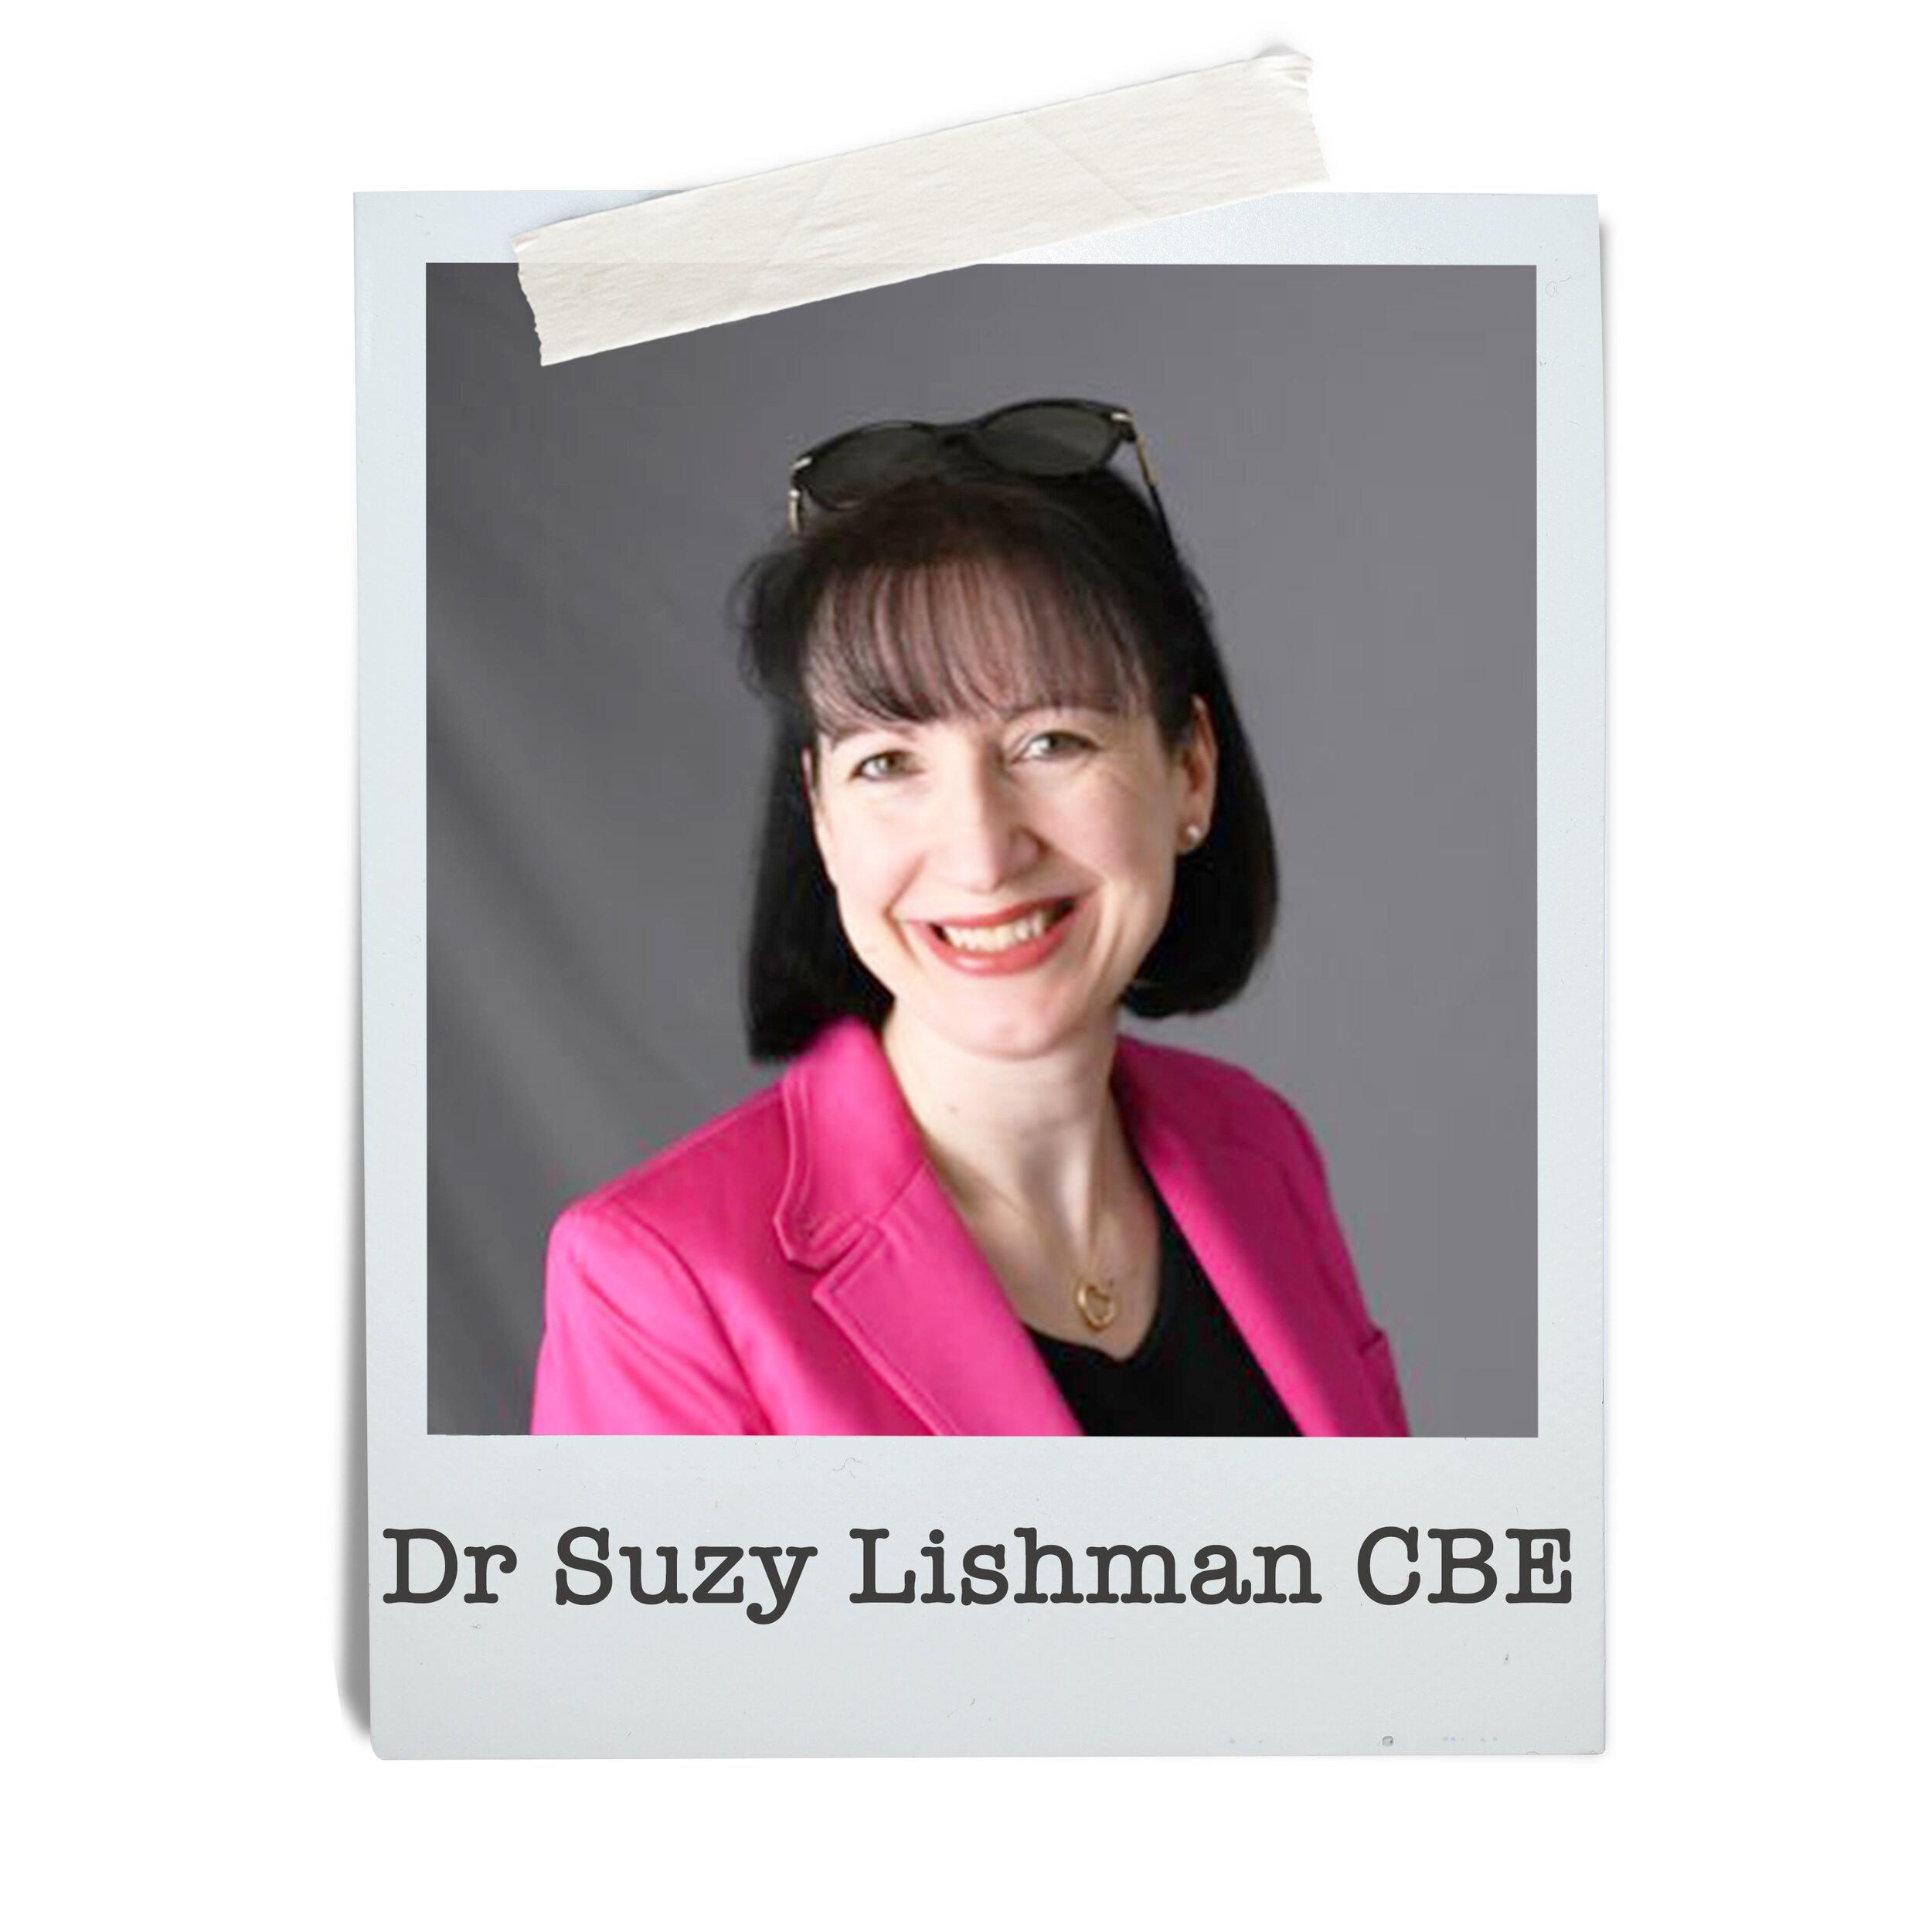 Dr Suzy Lishman CBE